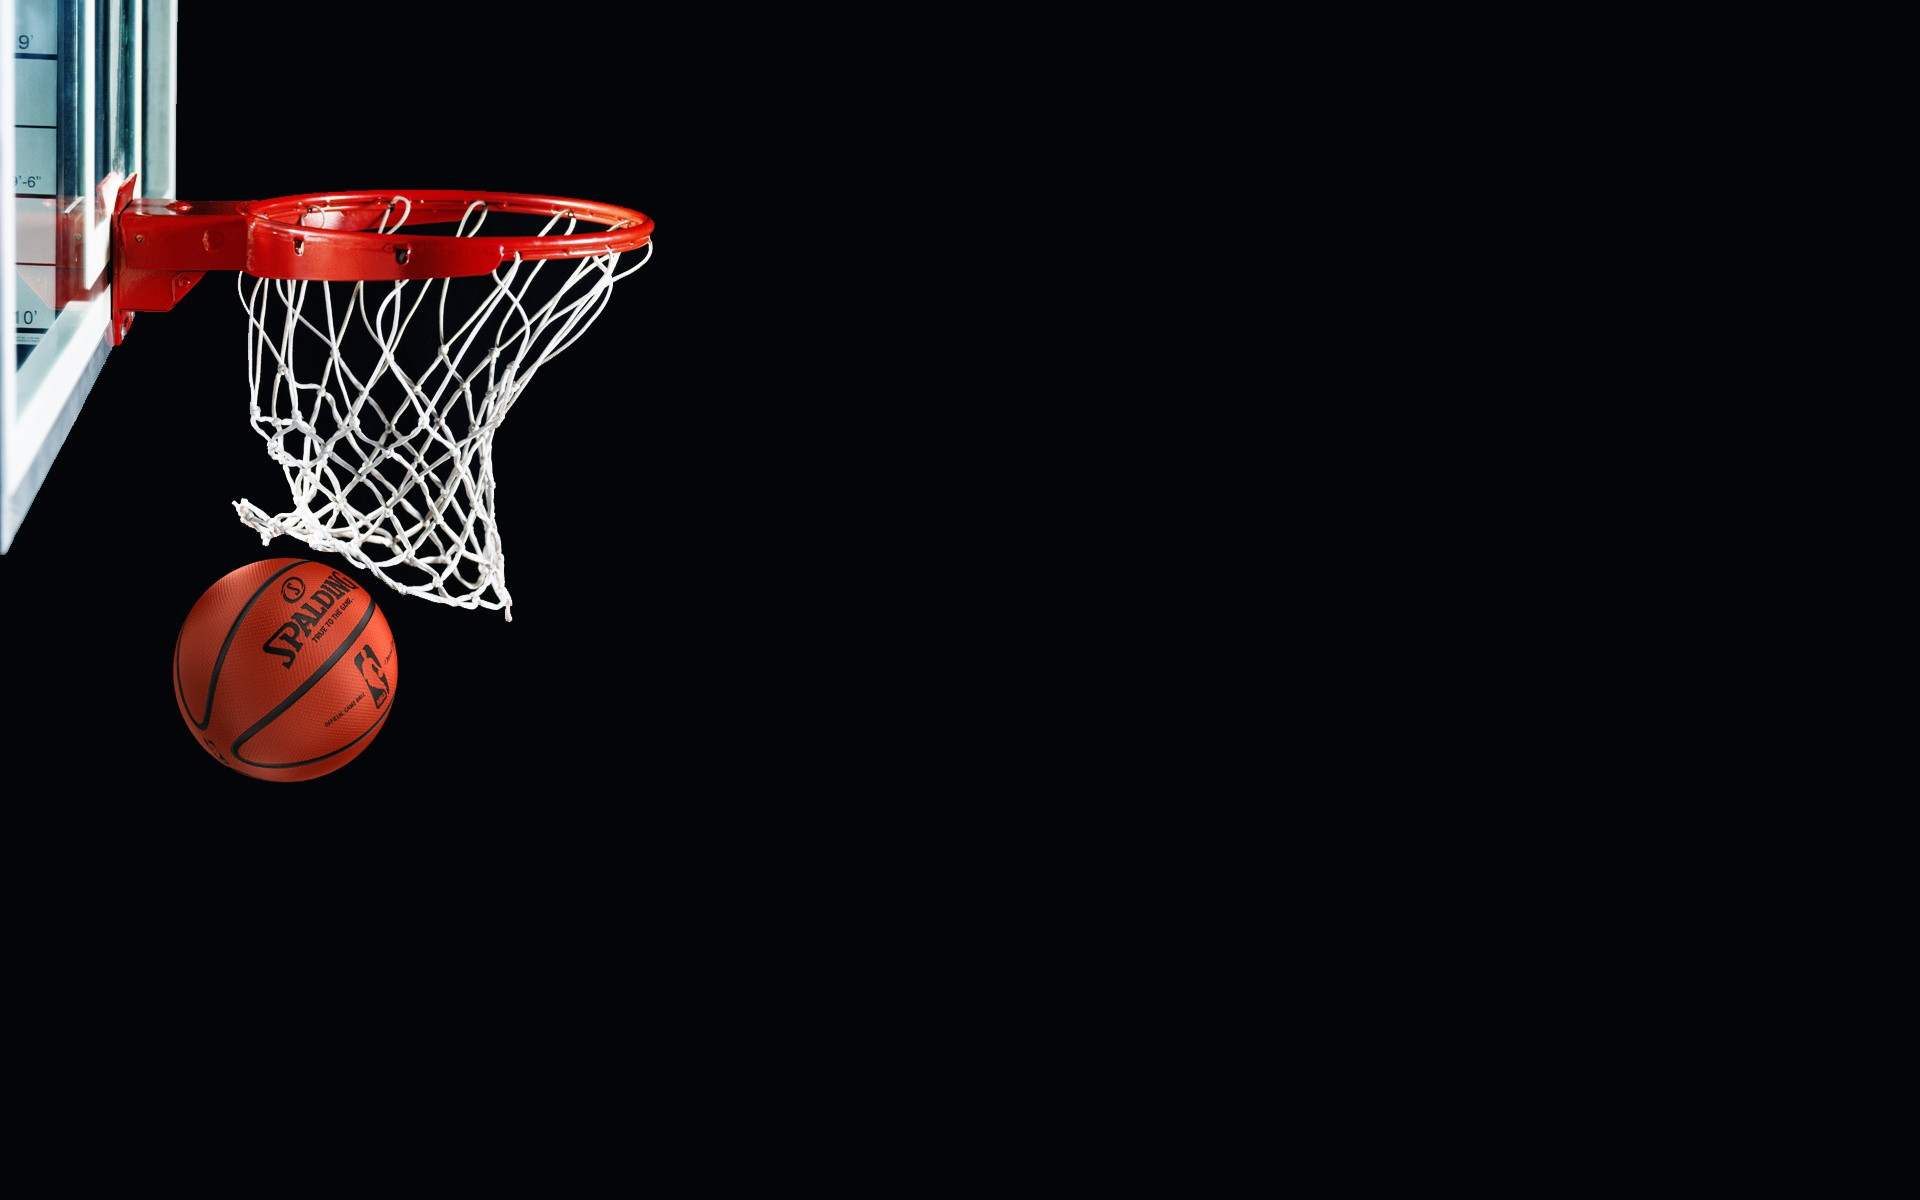 basketball wallpapers basketball wallpapers 2015 basketball wallpapers .